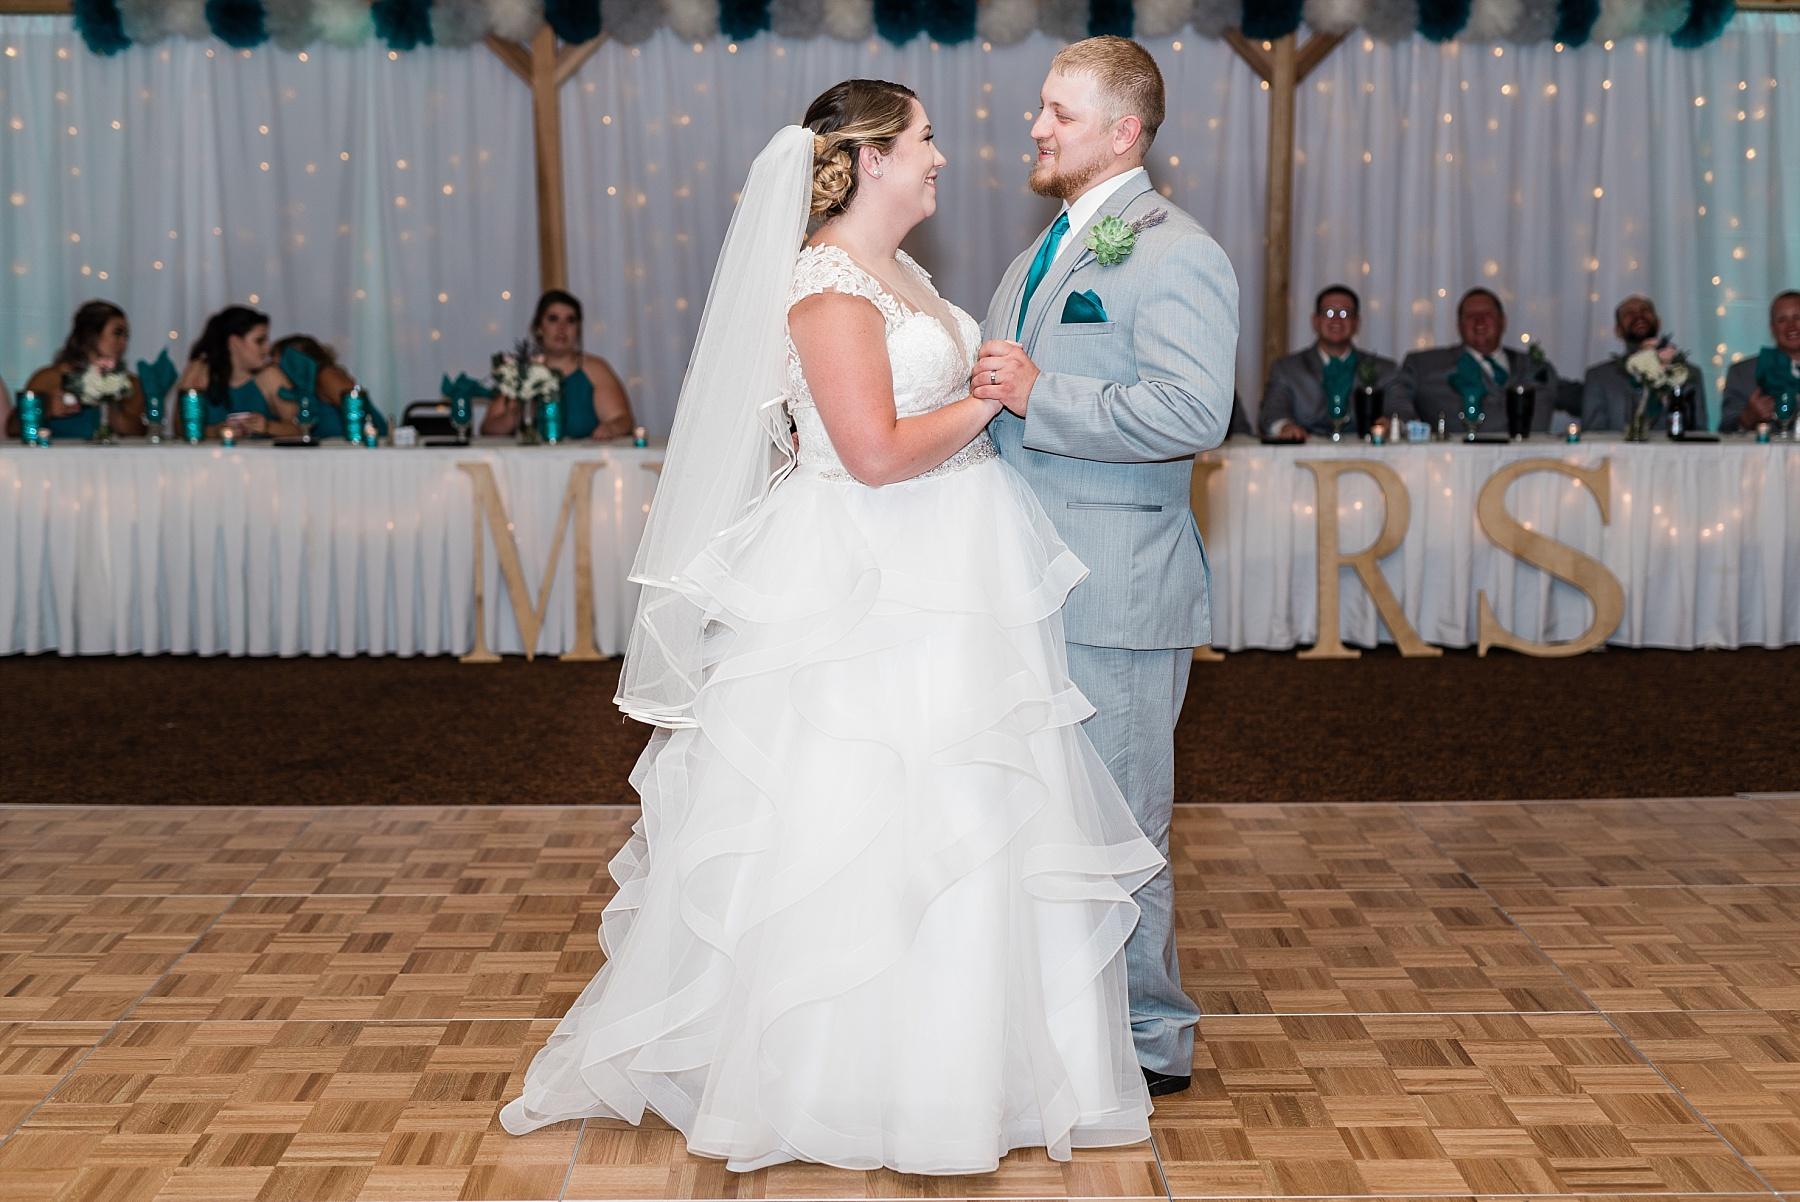 Baurichter Wedding at Stoney Creek Inn Columbia Missouri by Kelsi Kliethermes Photography_0027.jpg